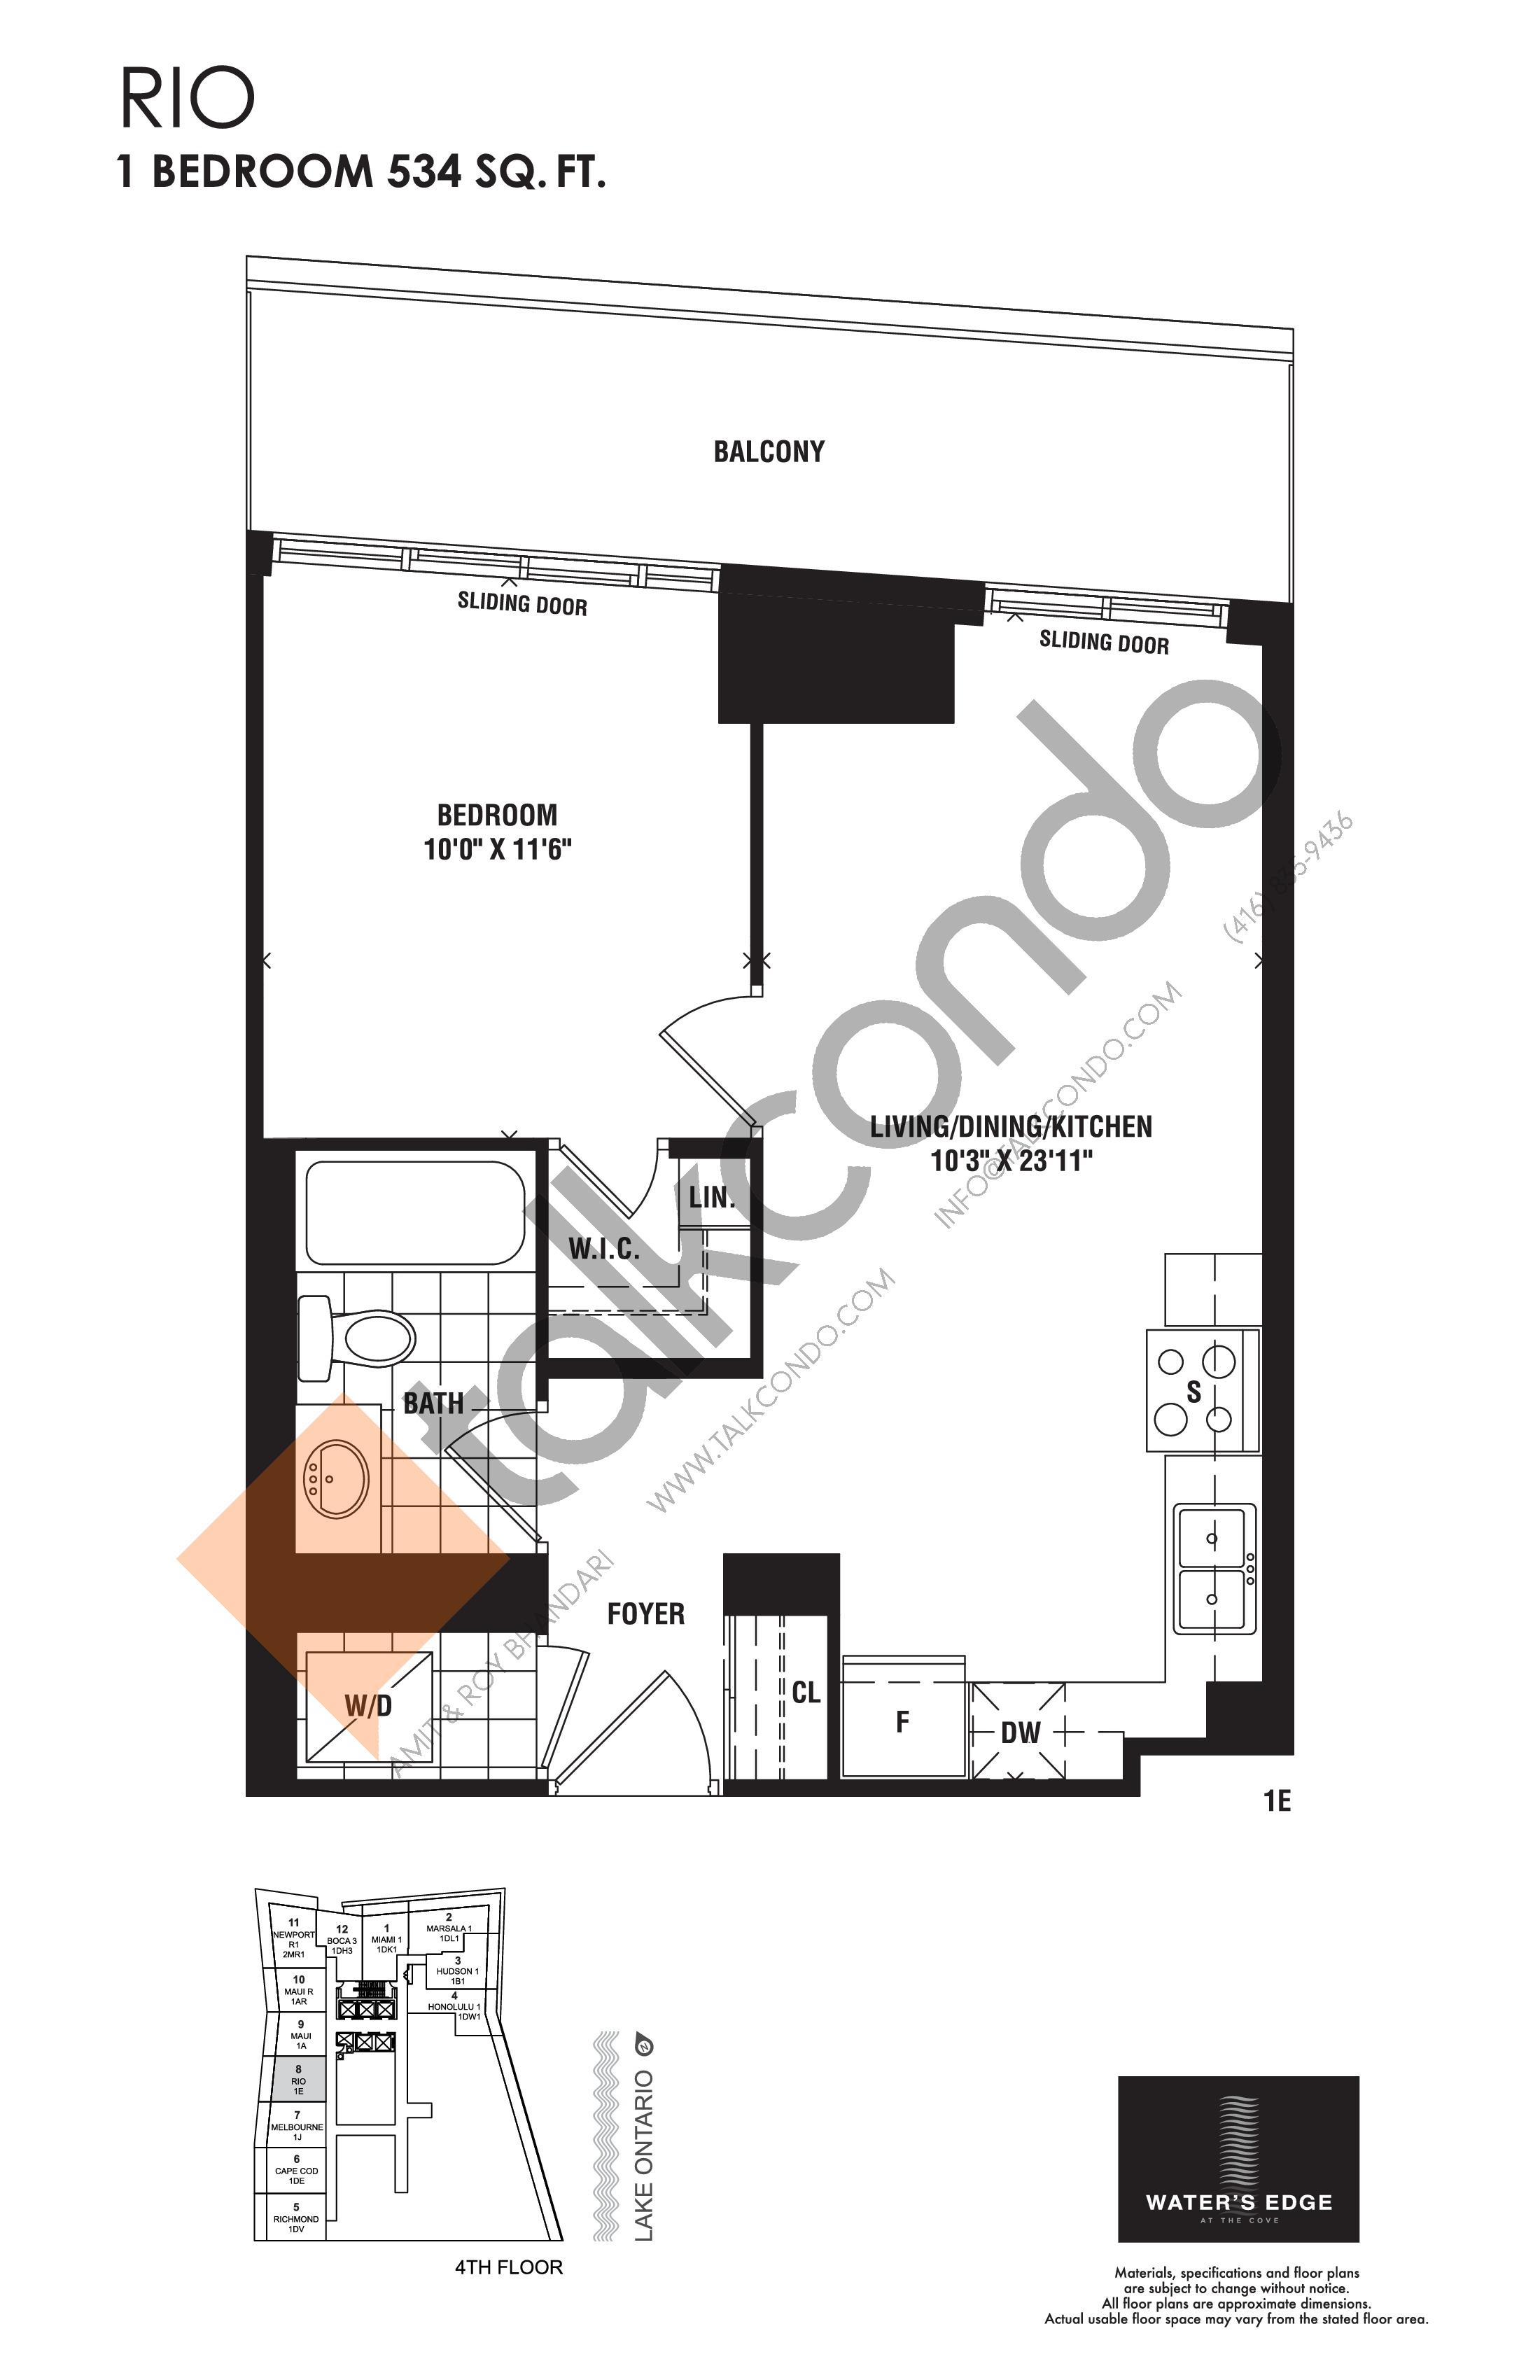 Rio Floor Plan at Water's Edge at the Cove Condos - 534 sq.ft